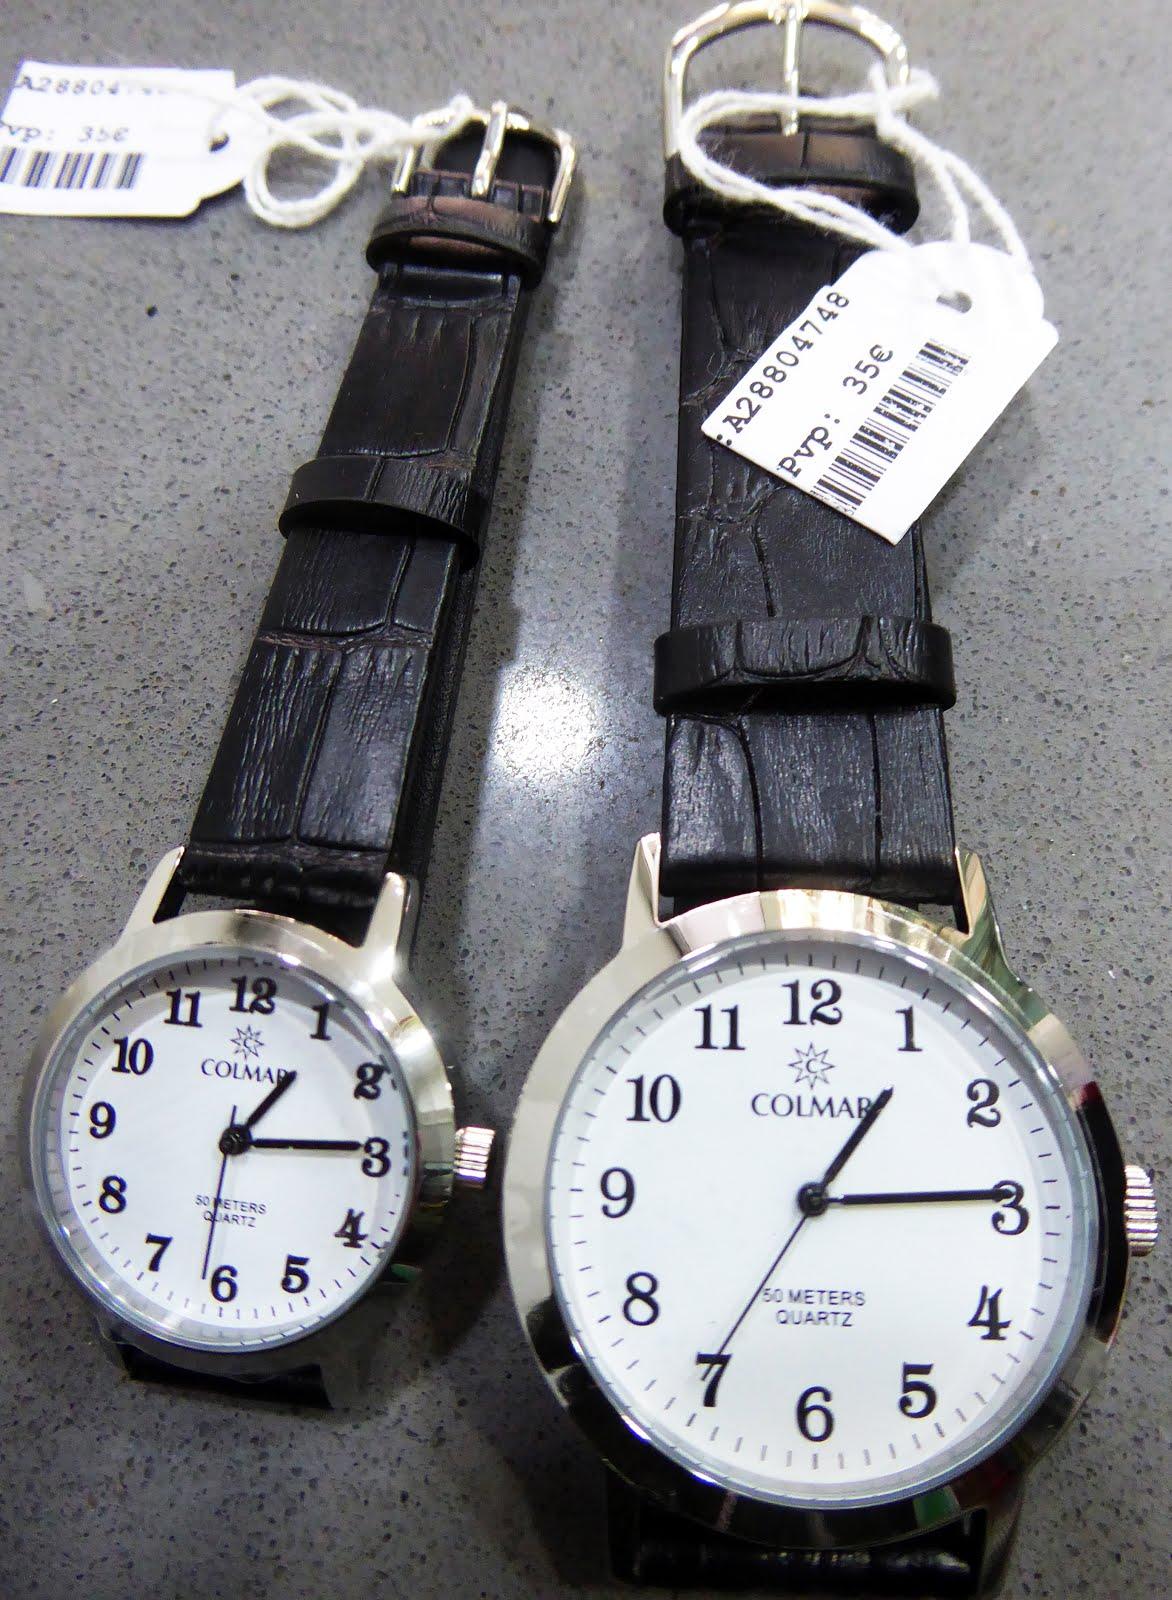 Relojes Clásicos, números grandes